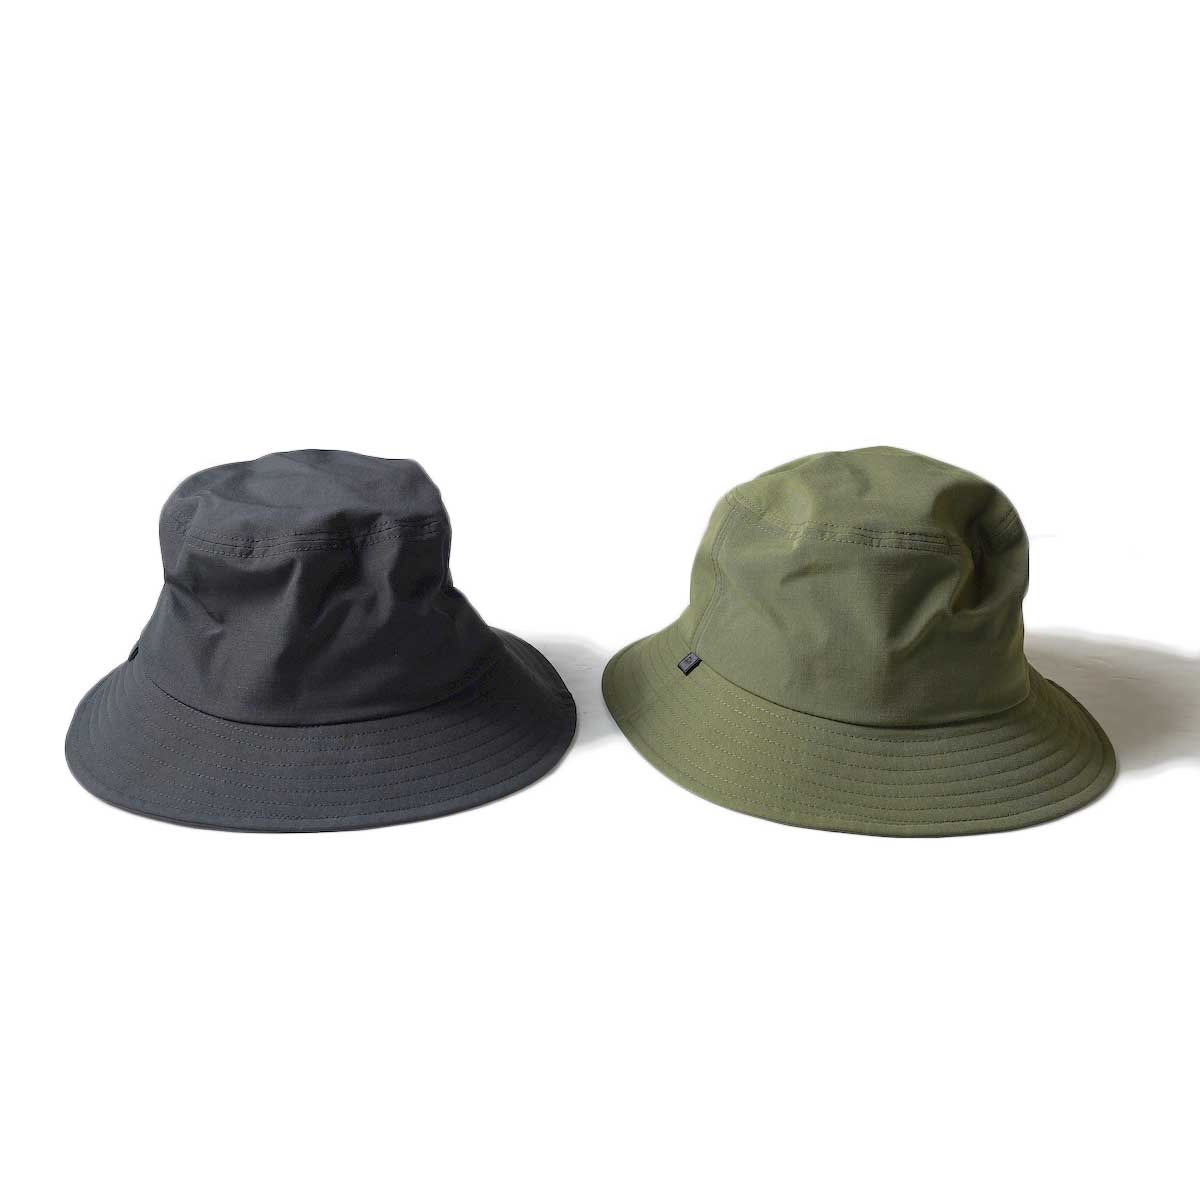 DAIWA PIER39 / Tech Bucket Hat (RIP-STOP)